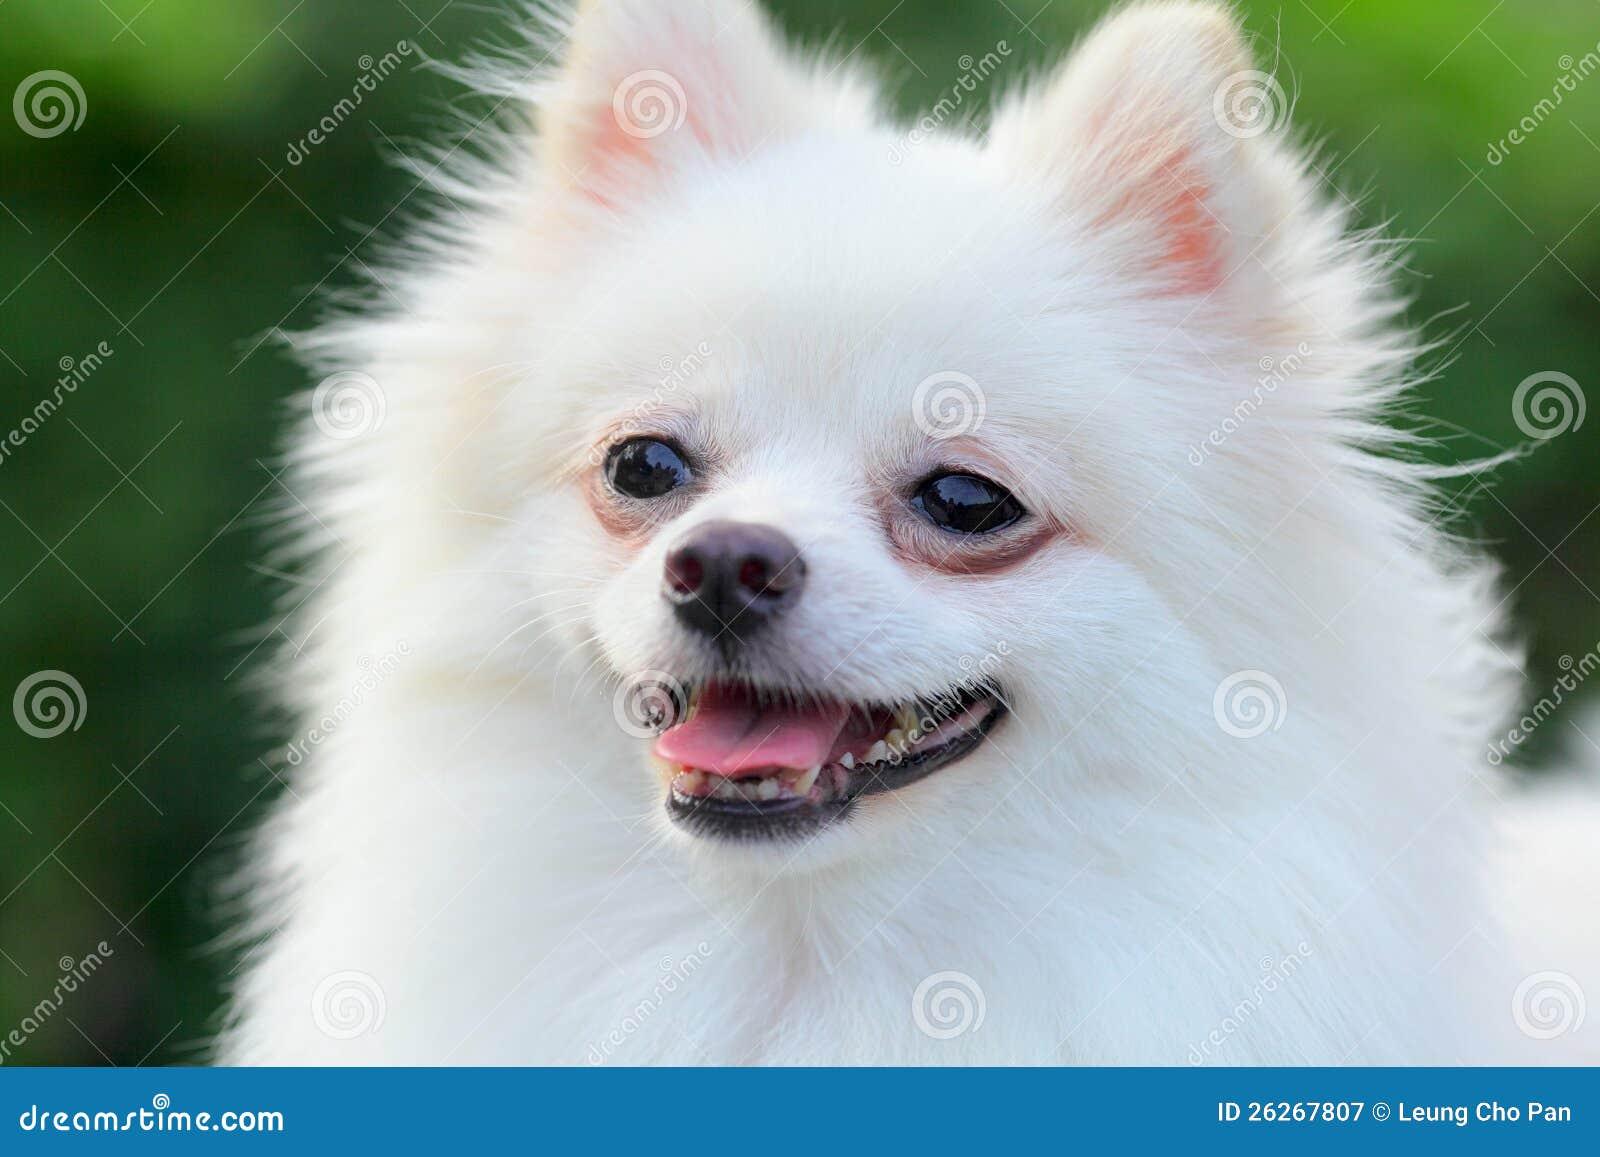 Pomeranian white full grown - photo#13